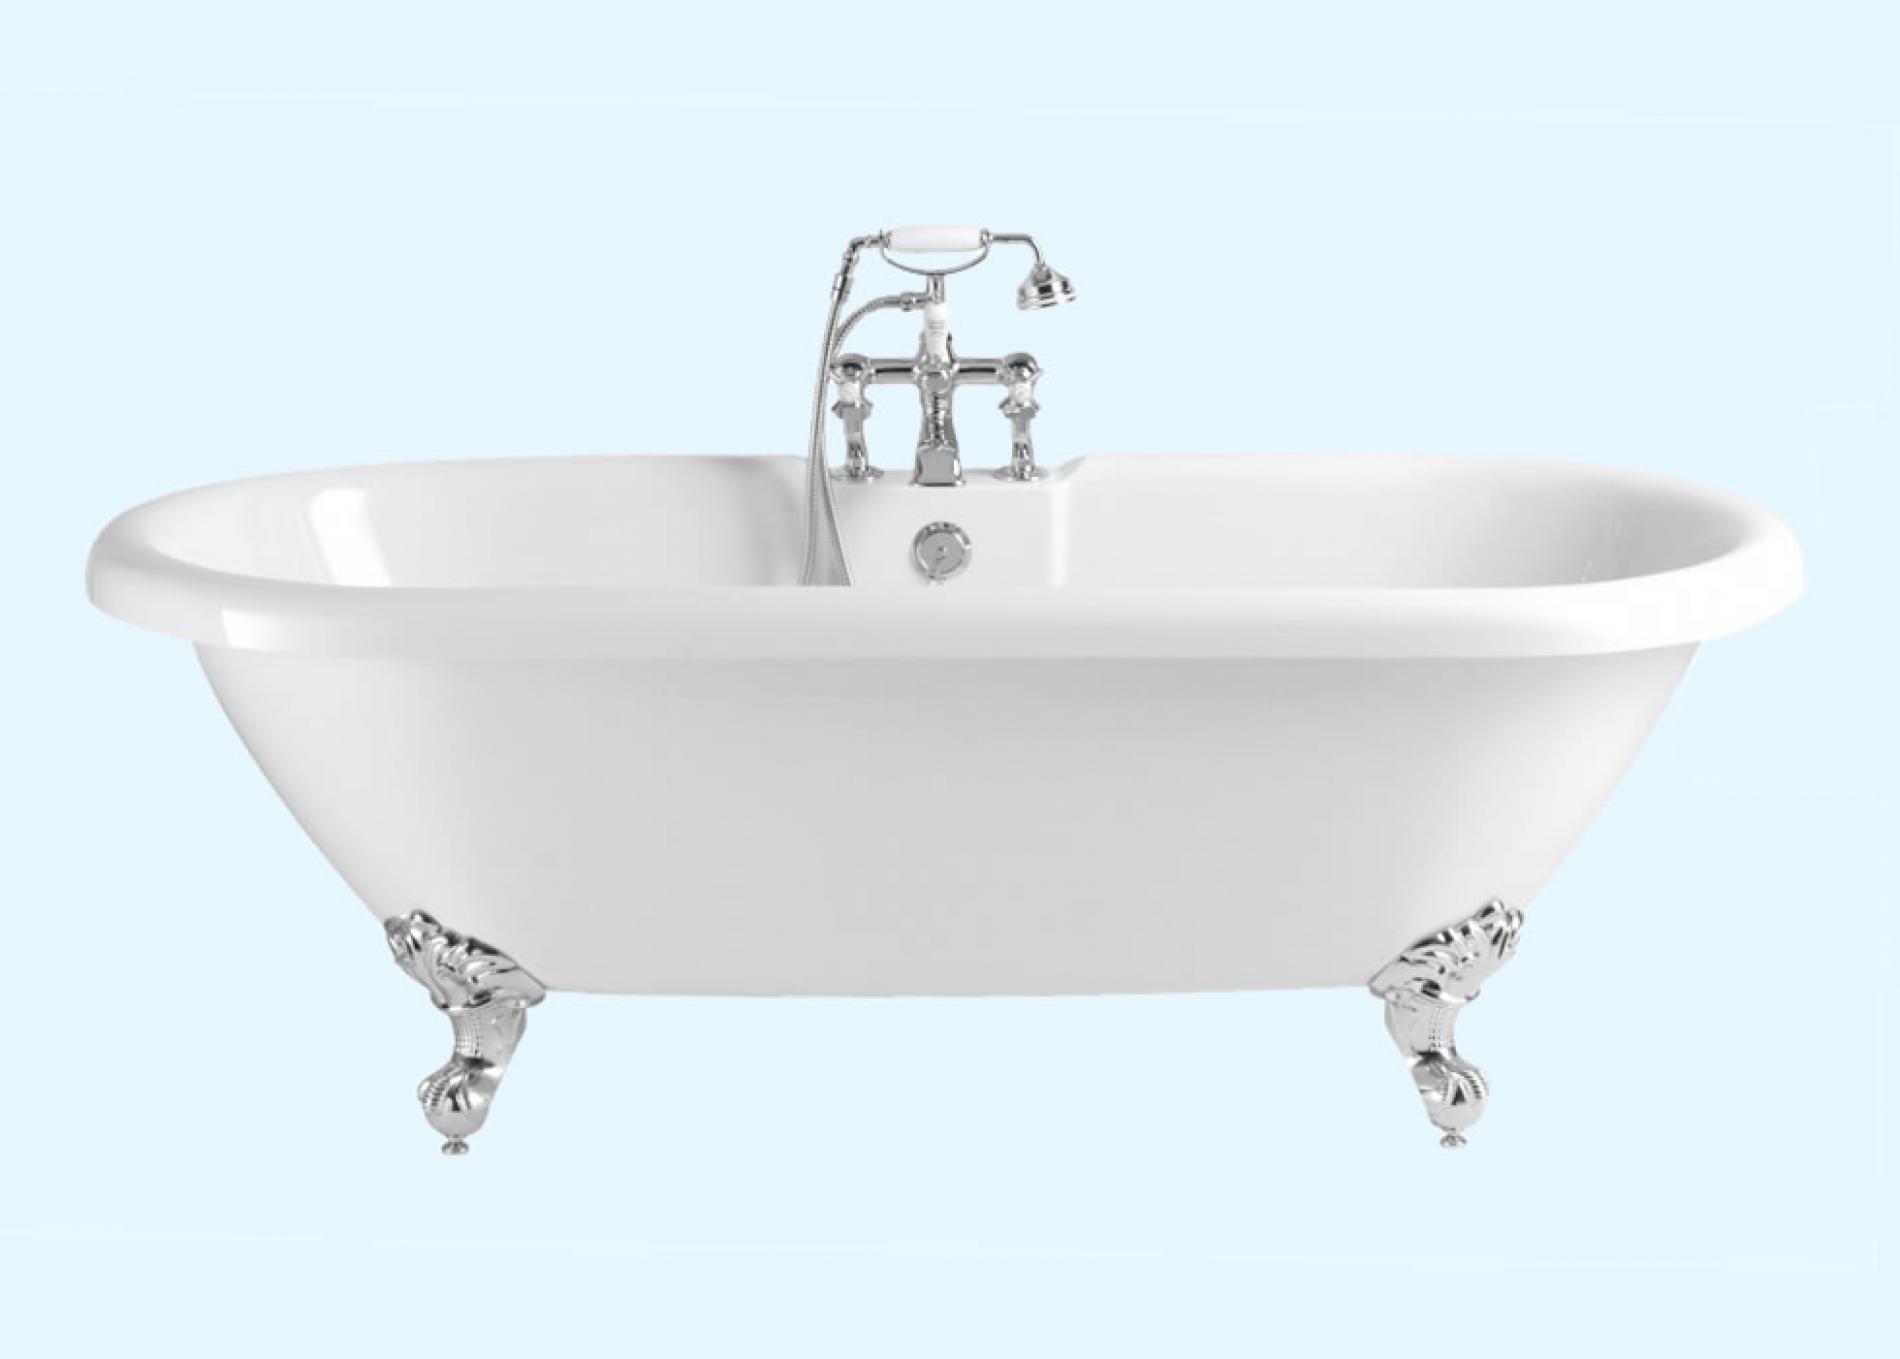 Bathroom Sinks Northern Ireland baths northern ireland | kildress plumbing